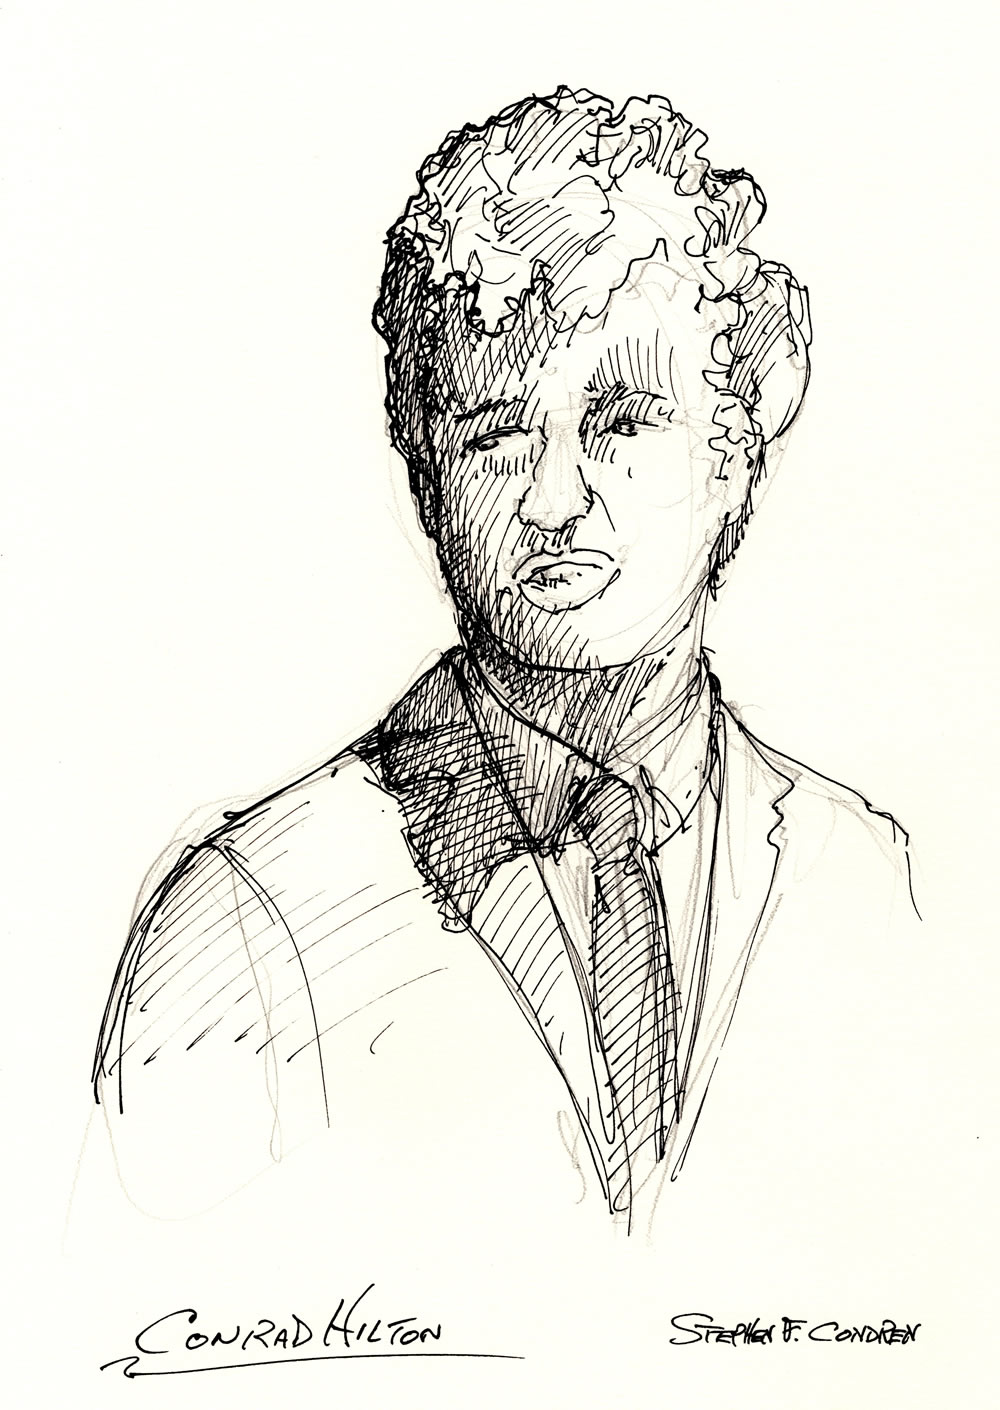 Conrad Hilton celebrity art pen & ink drawing